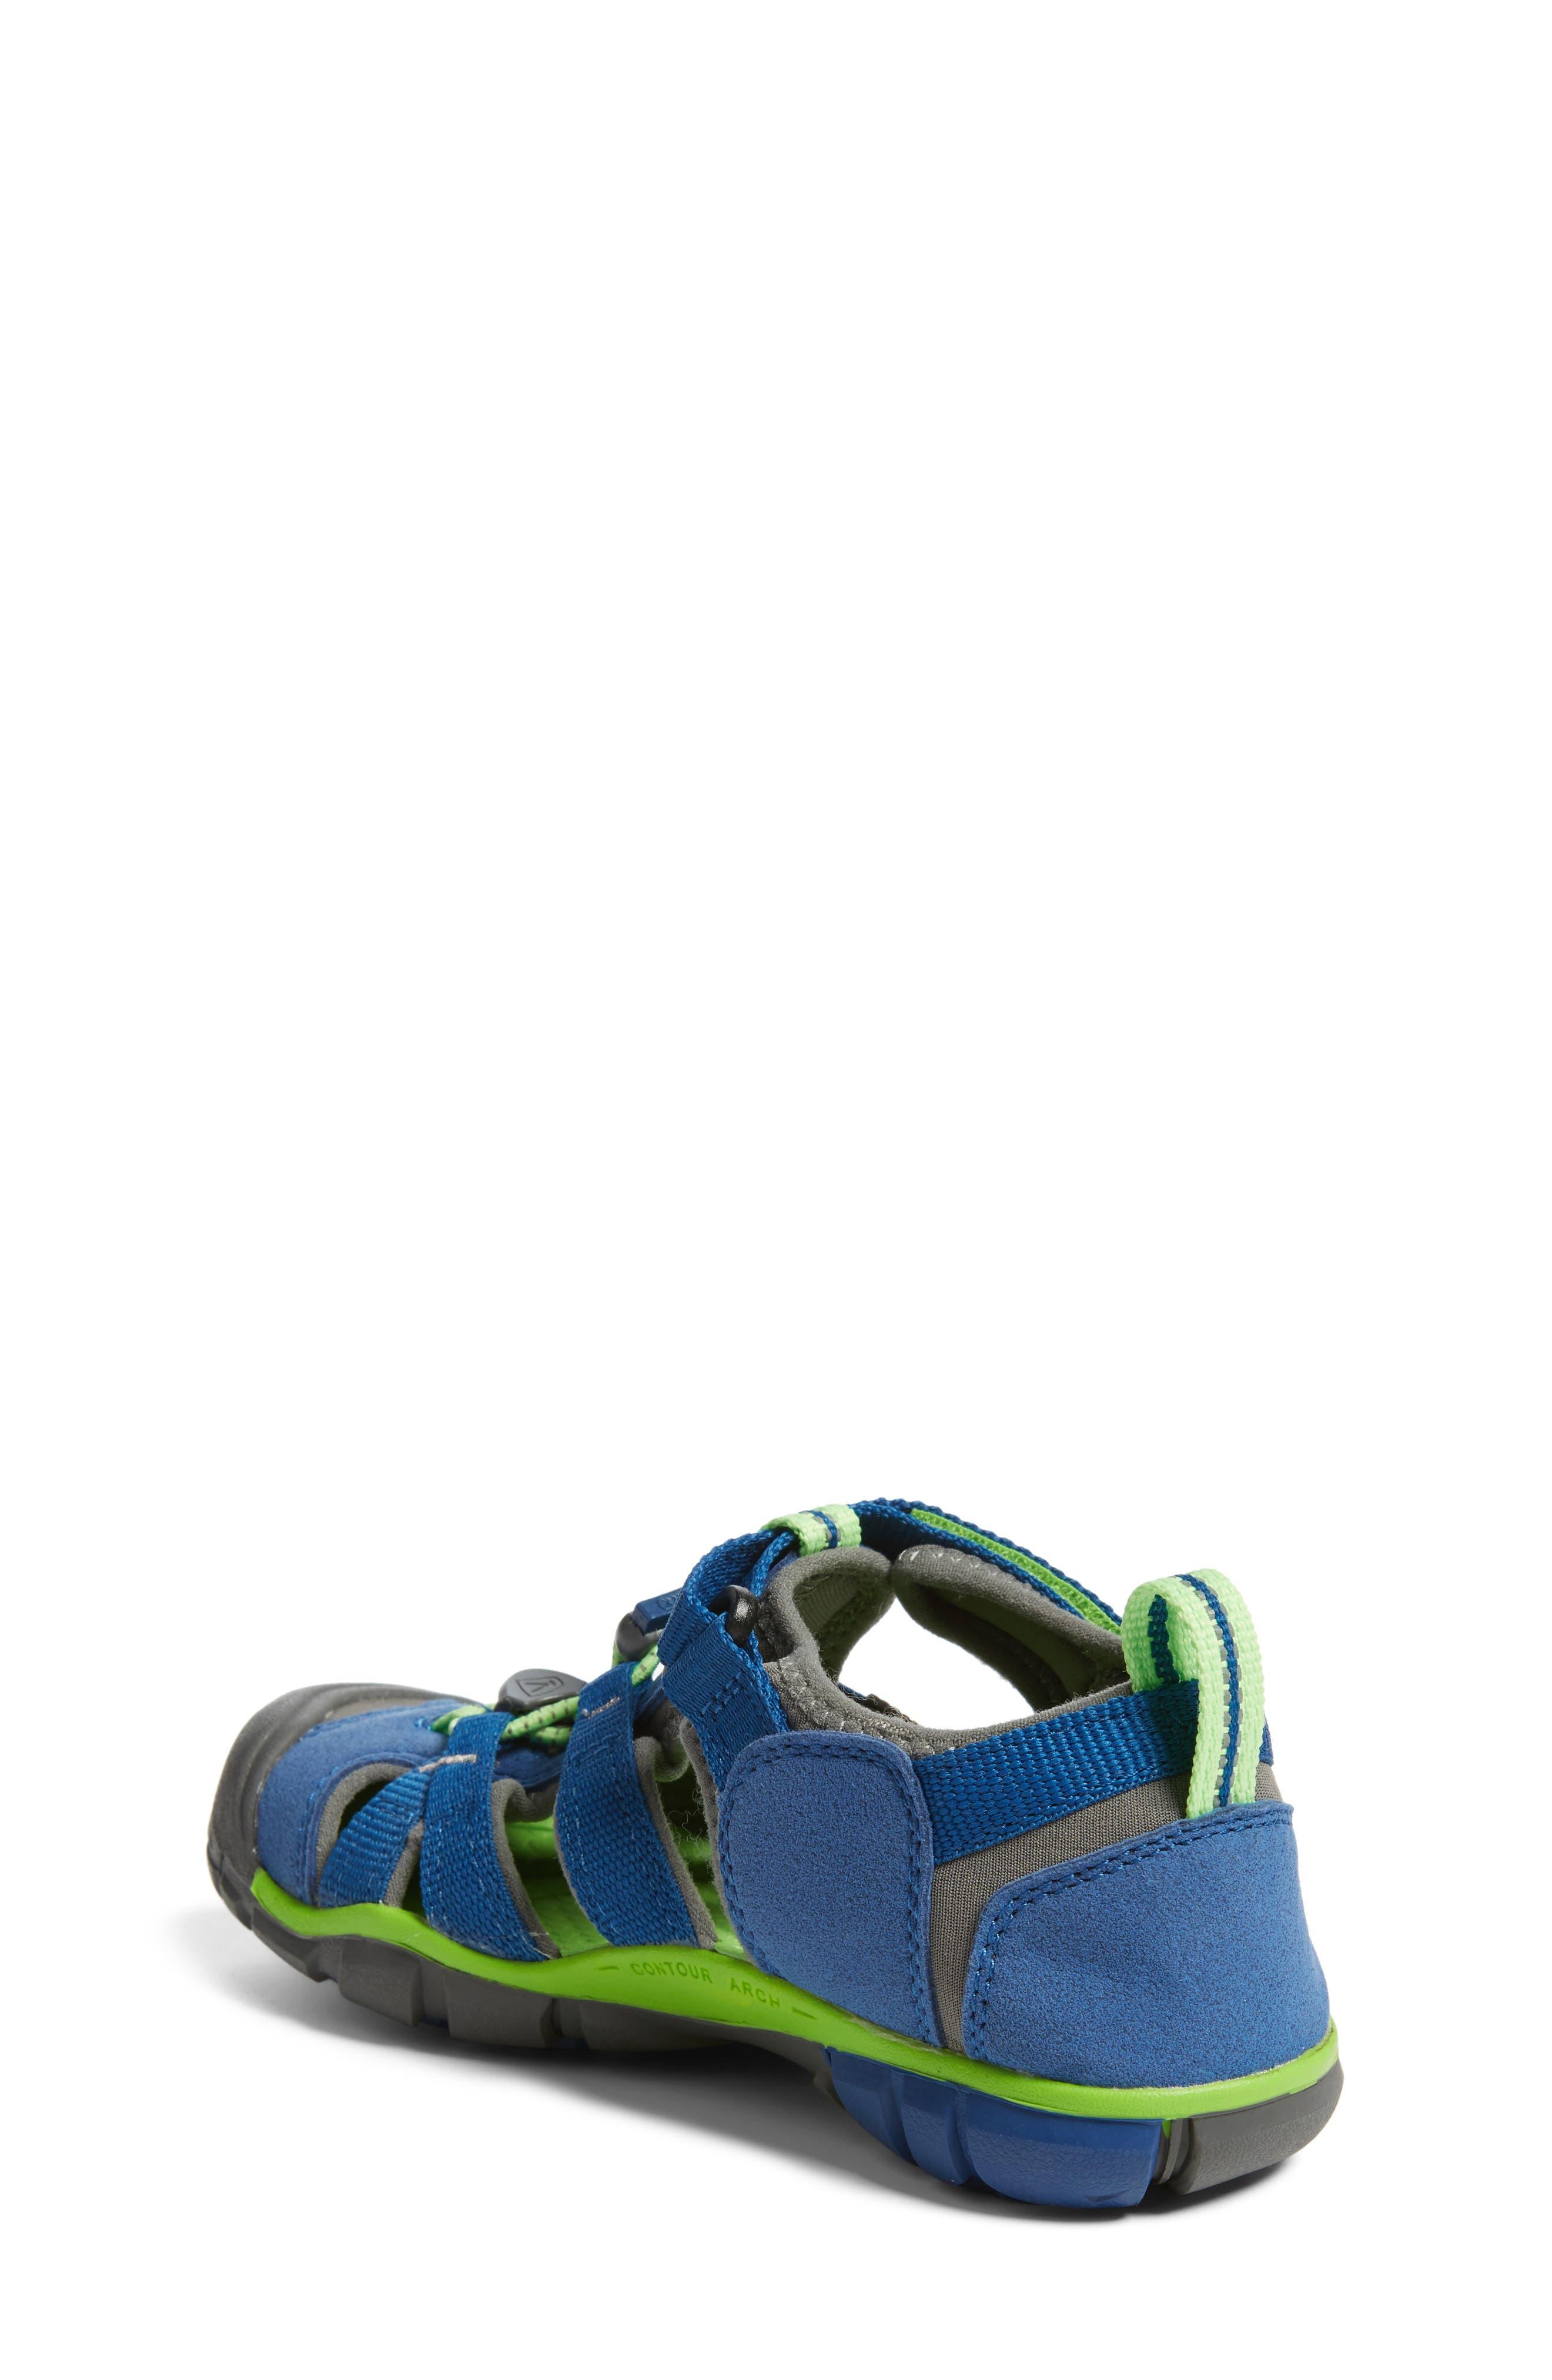 ,                             'Seacamp II' Water Friendly Sandal,                             Alternate thumbnail 146, color,                             400